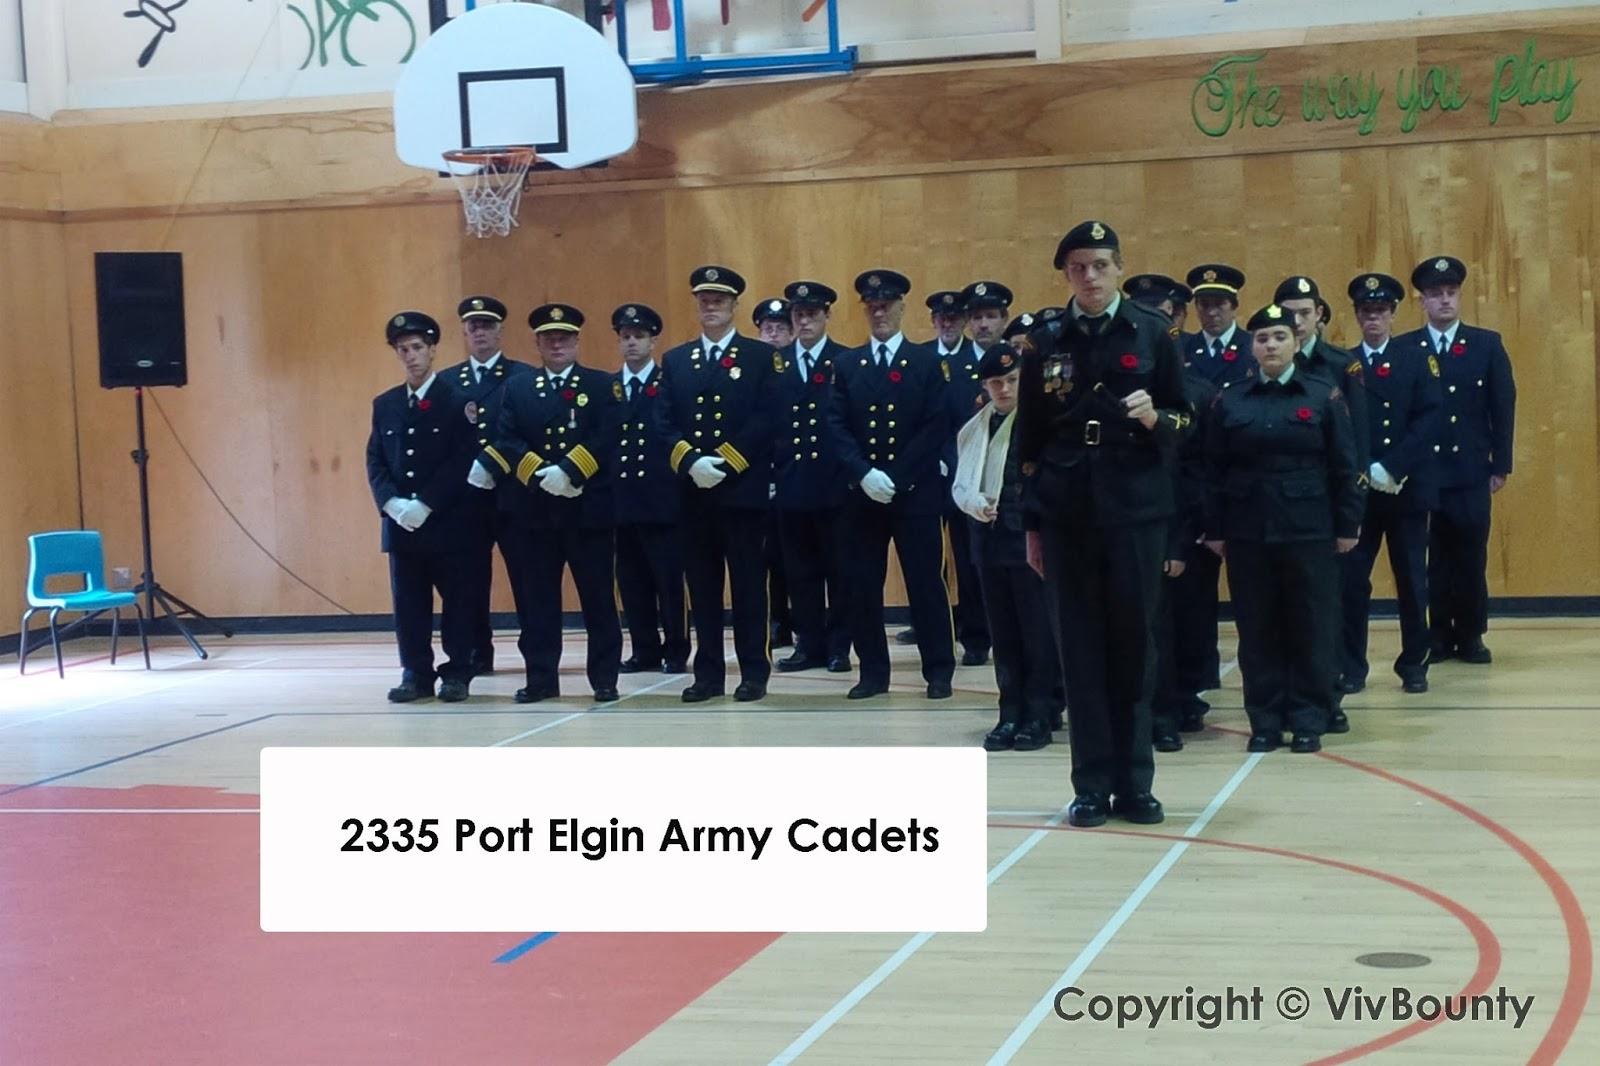 2335 Port Elgin Army Cadets, VivBounty